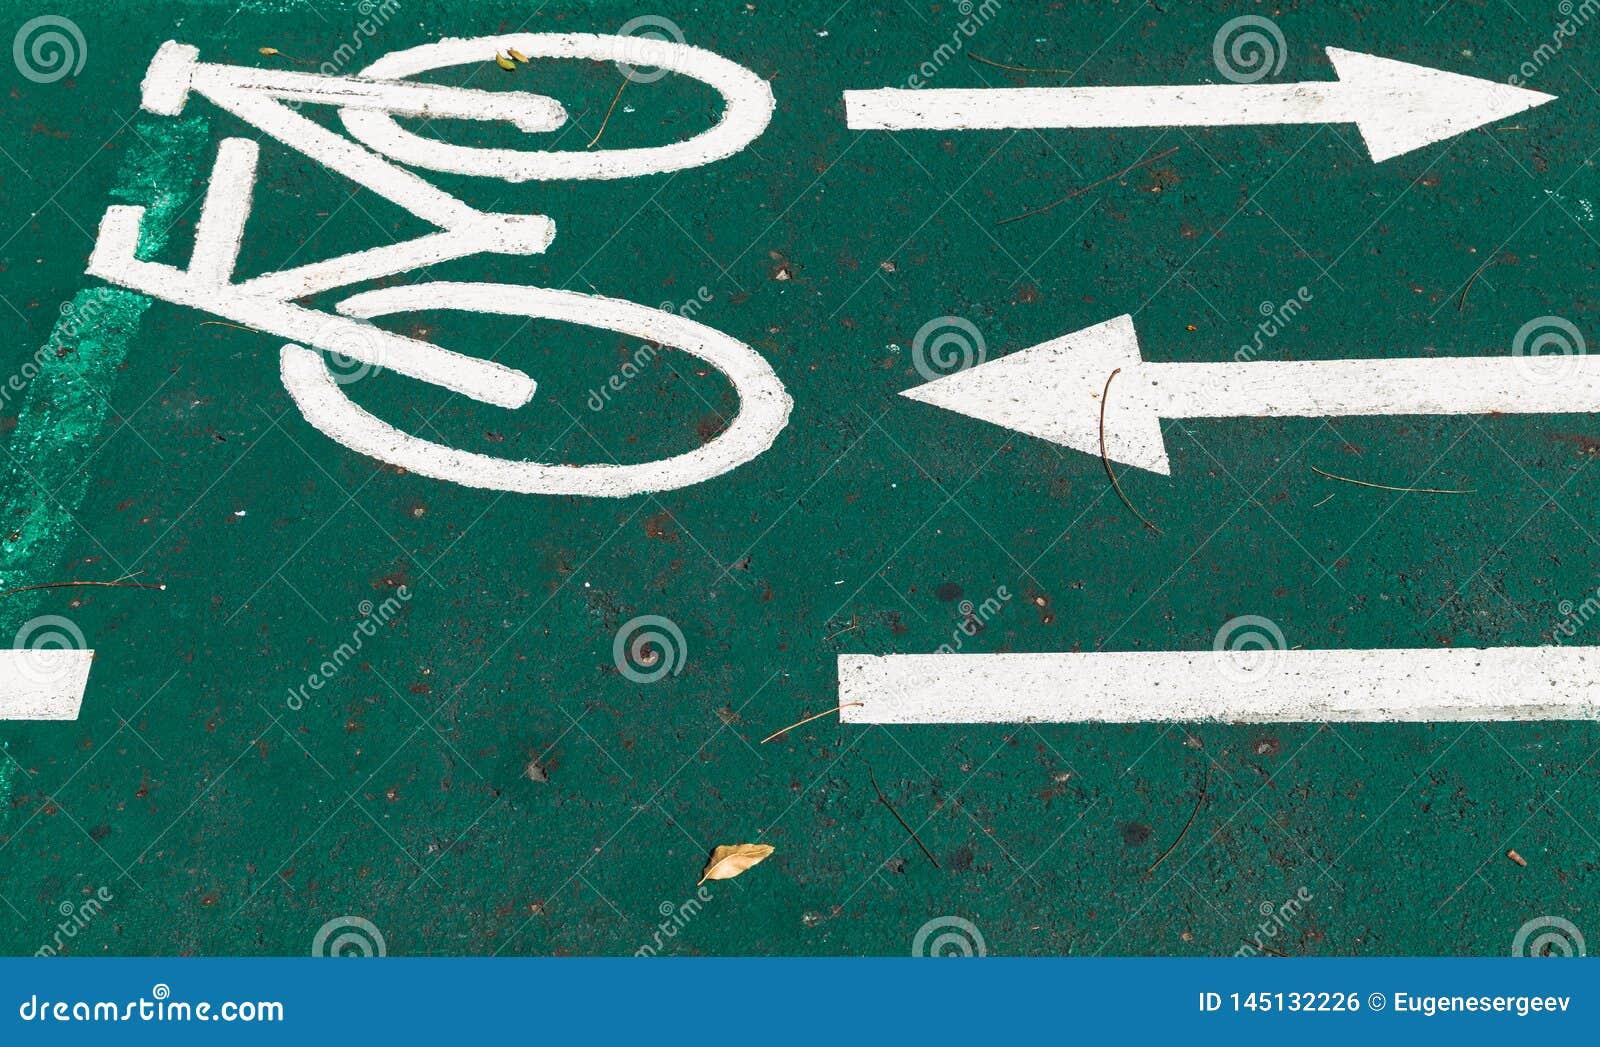 Carril de bicicleta, marca de camino con las flechas